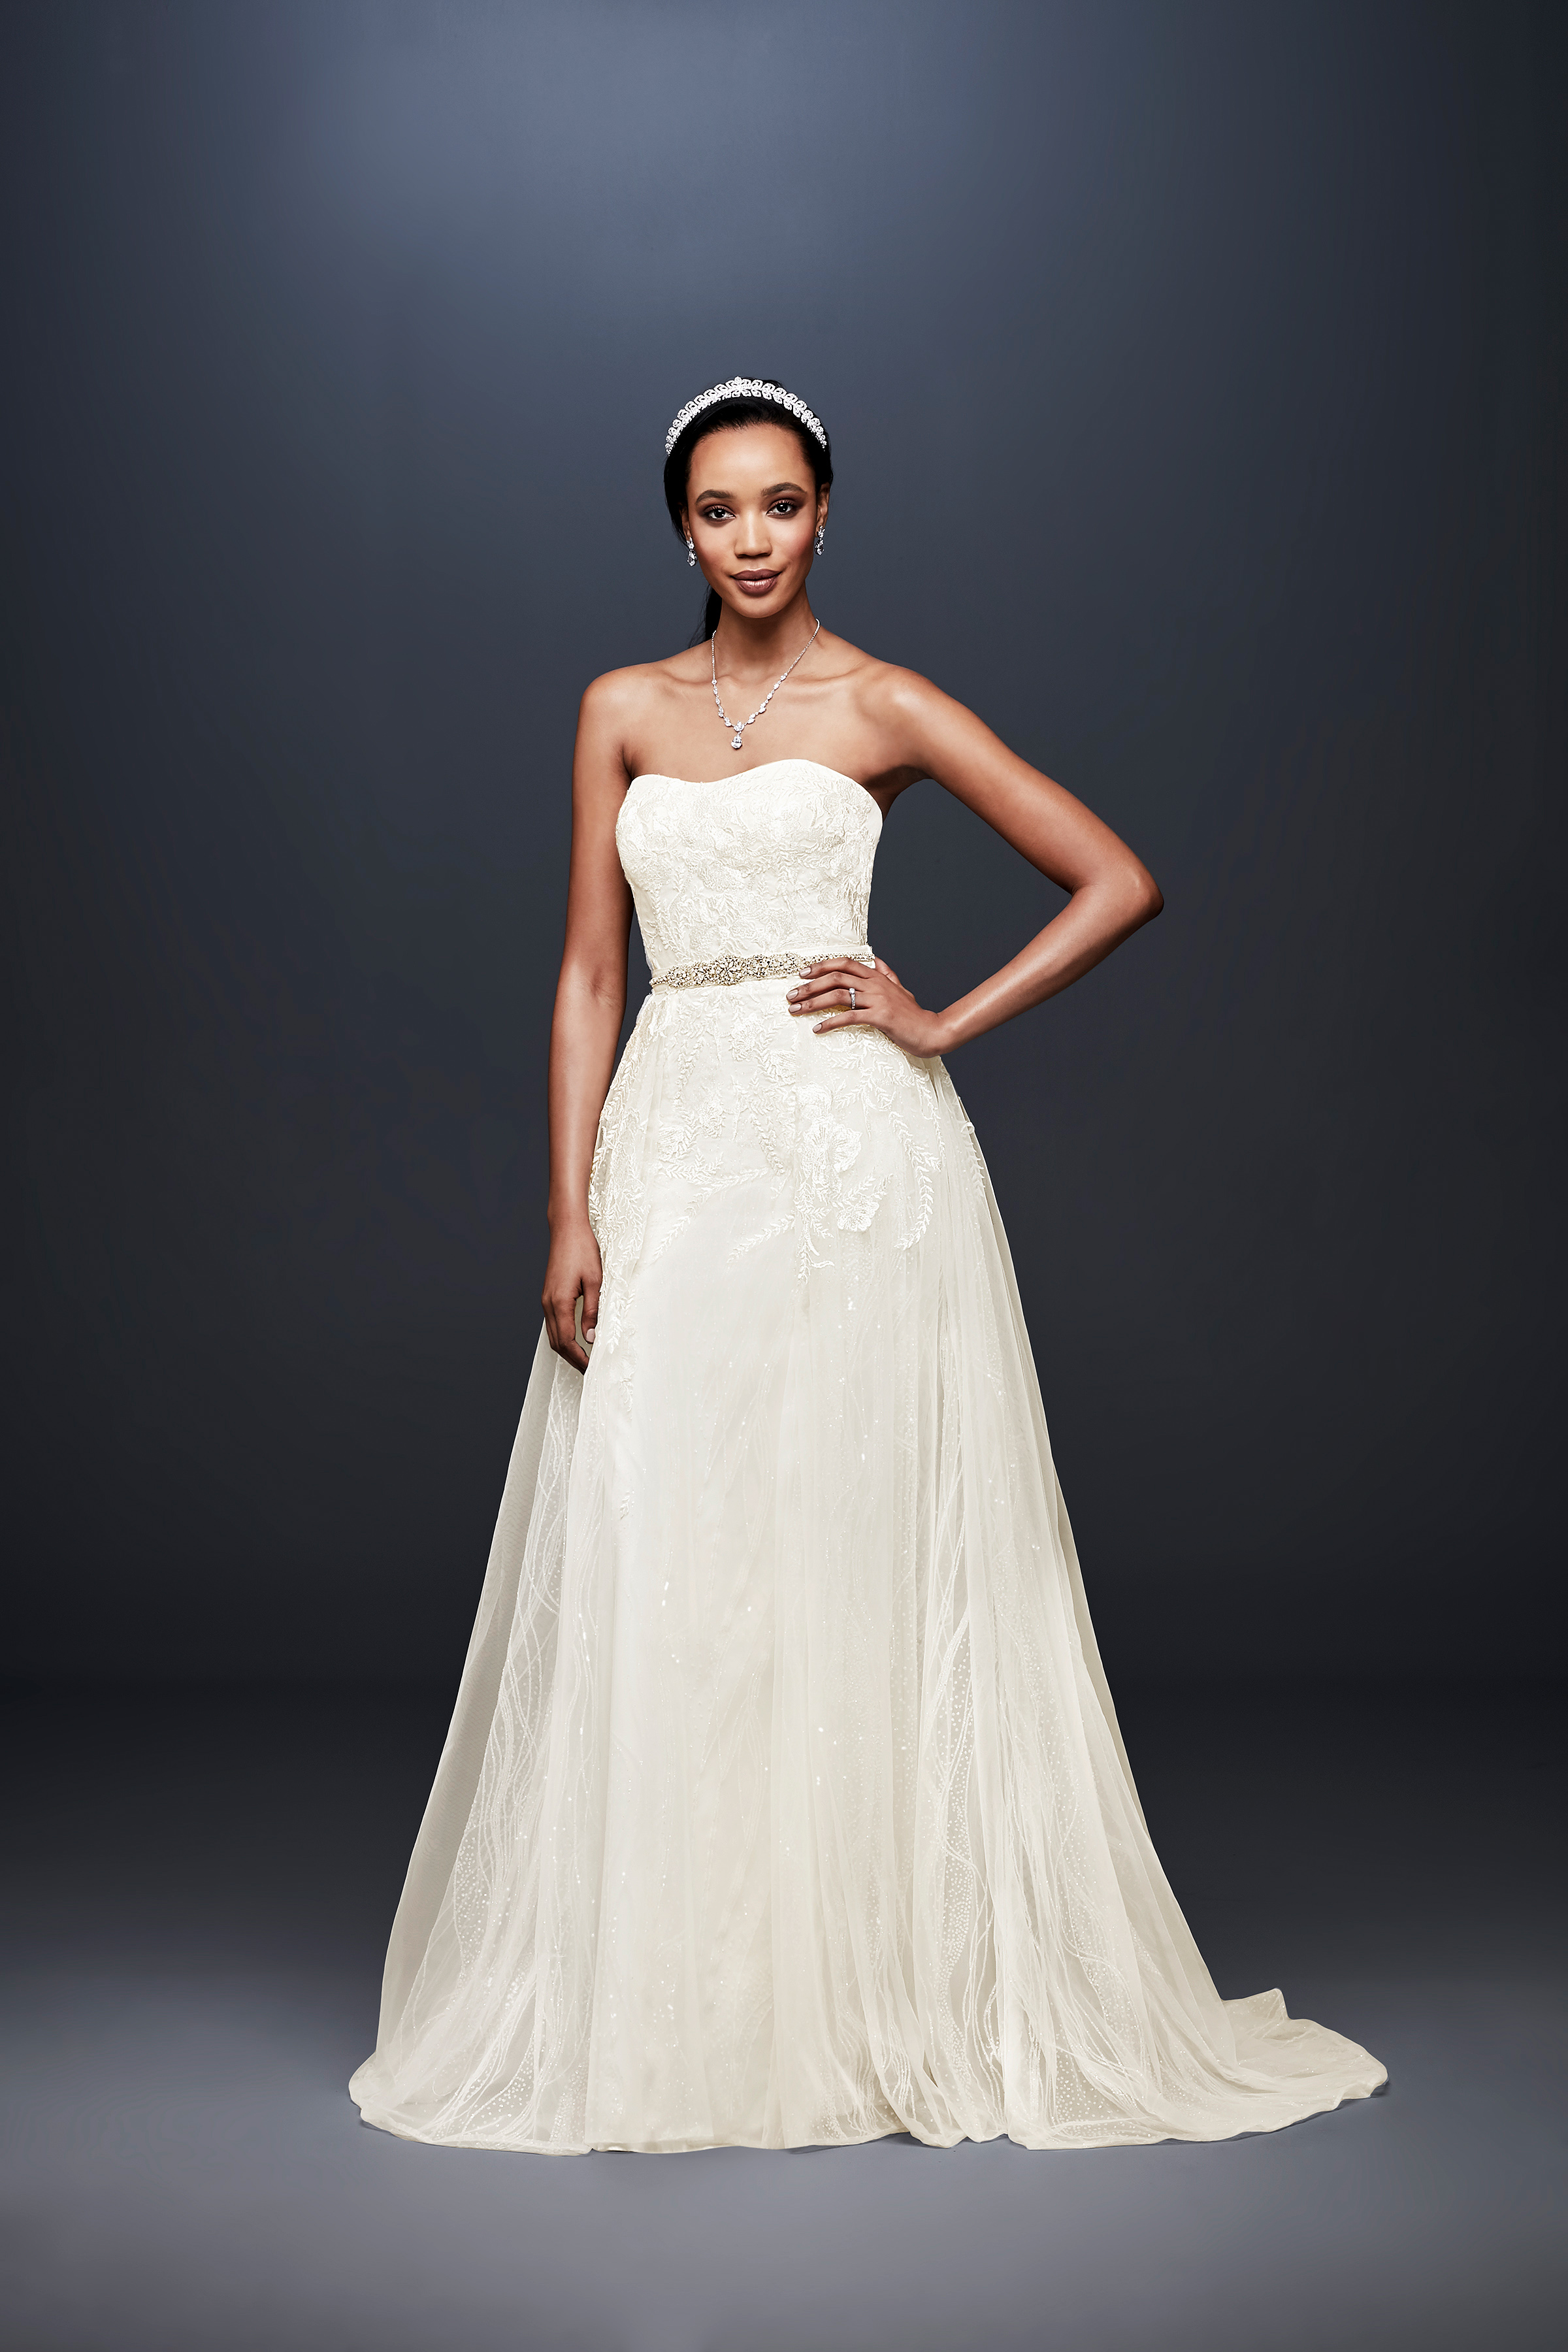 david bridal wedding dress spring 2019 strapless a-line sweatheart